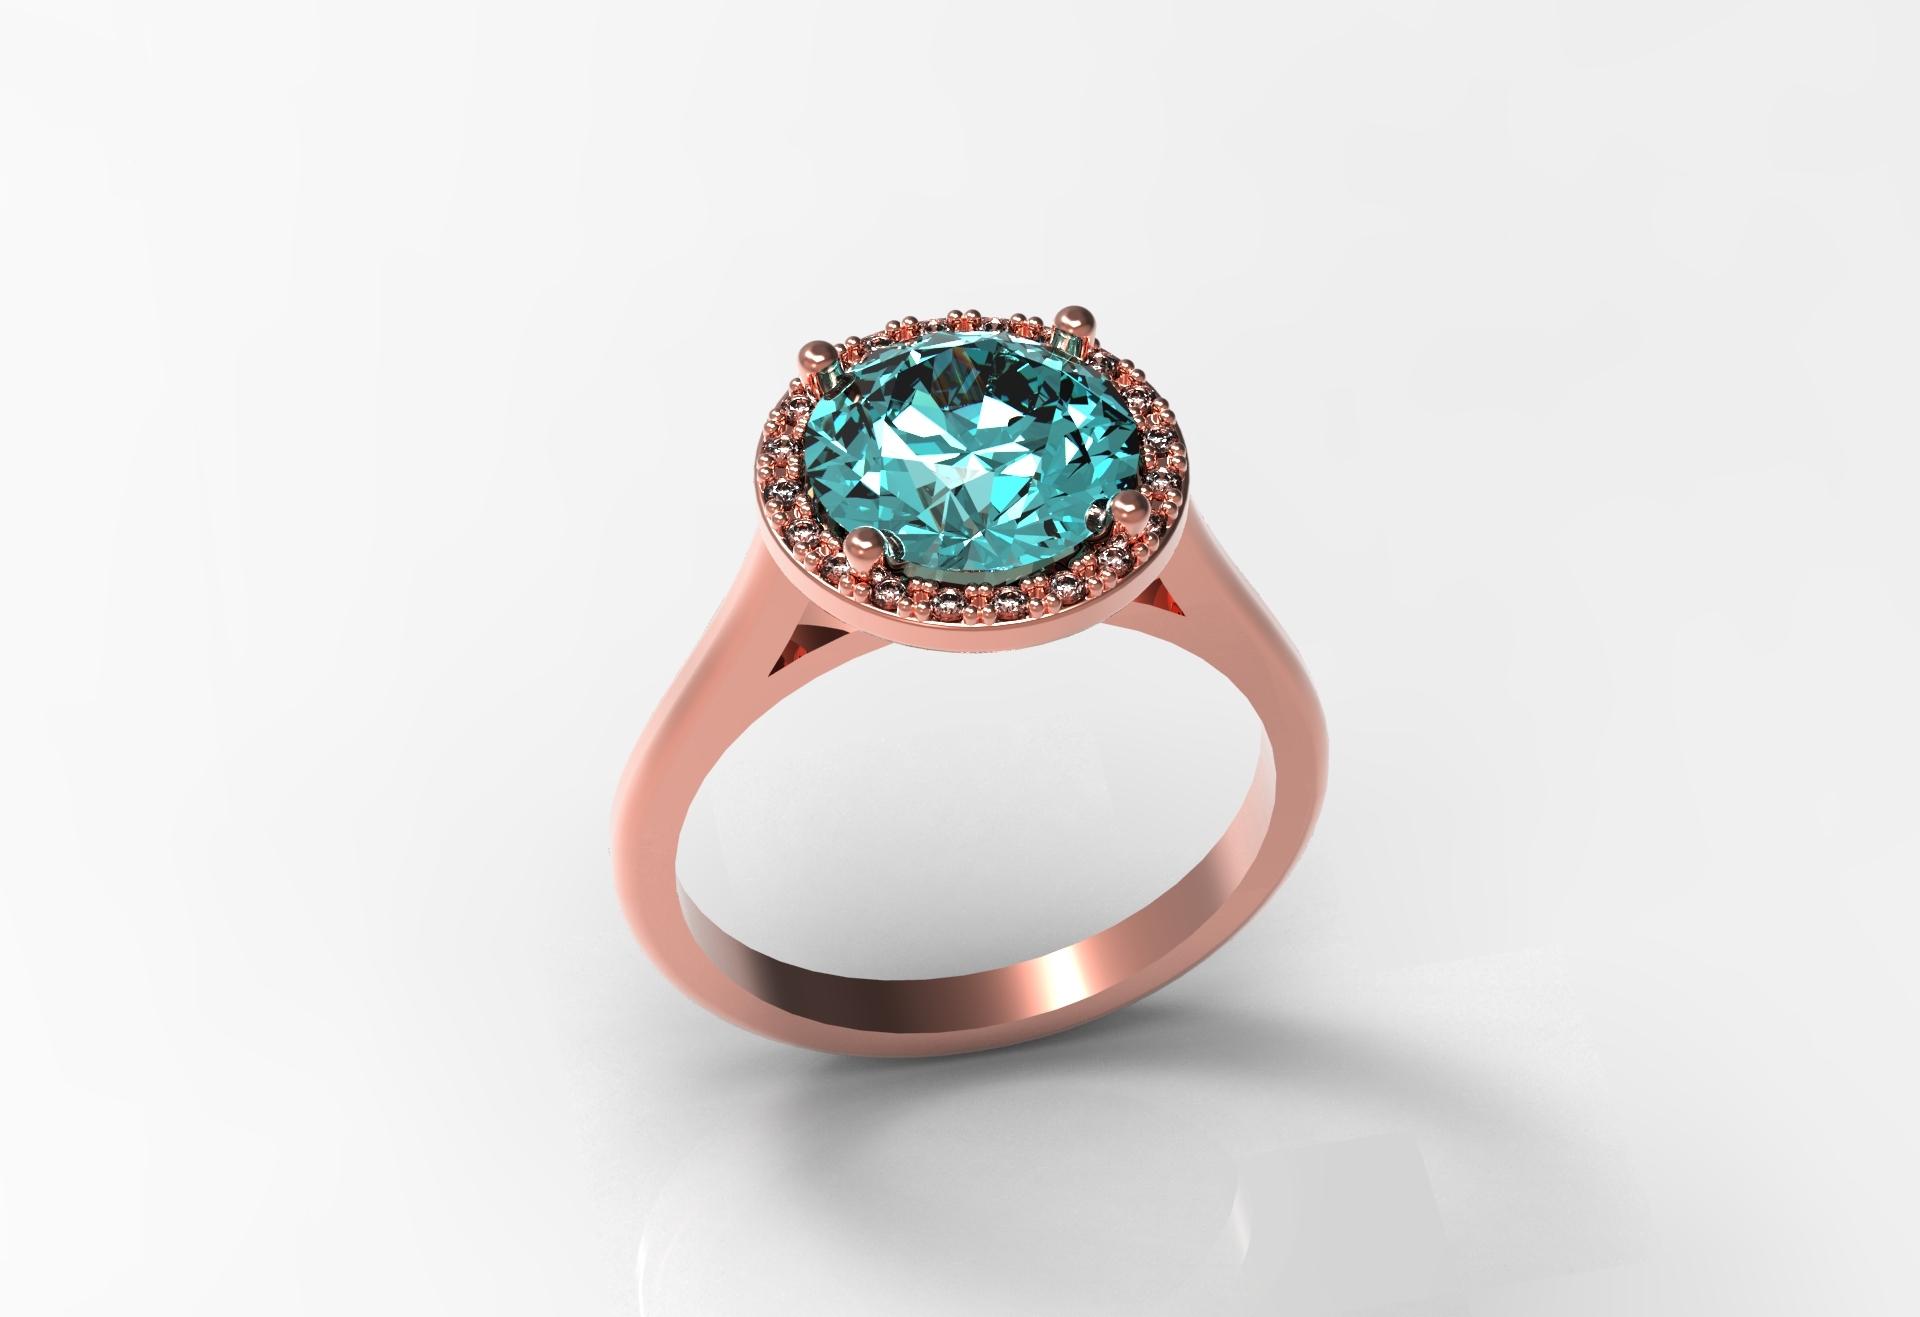 9mm center halo ring